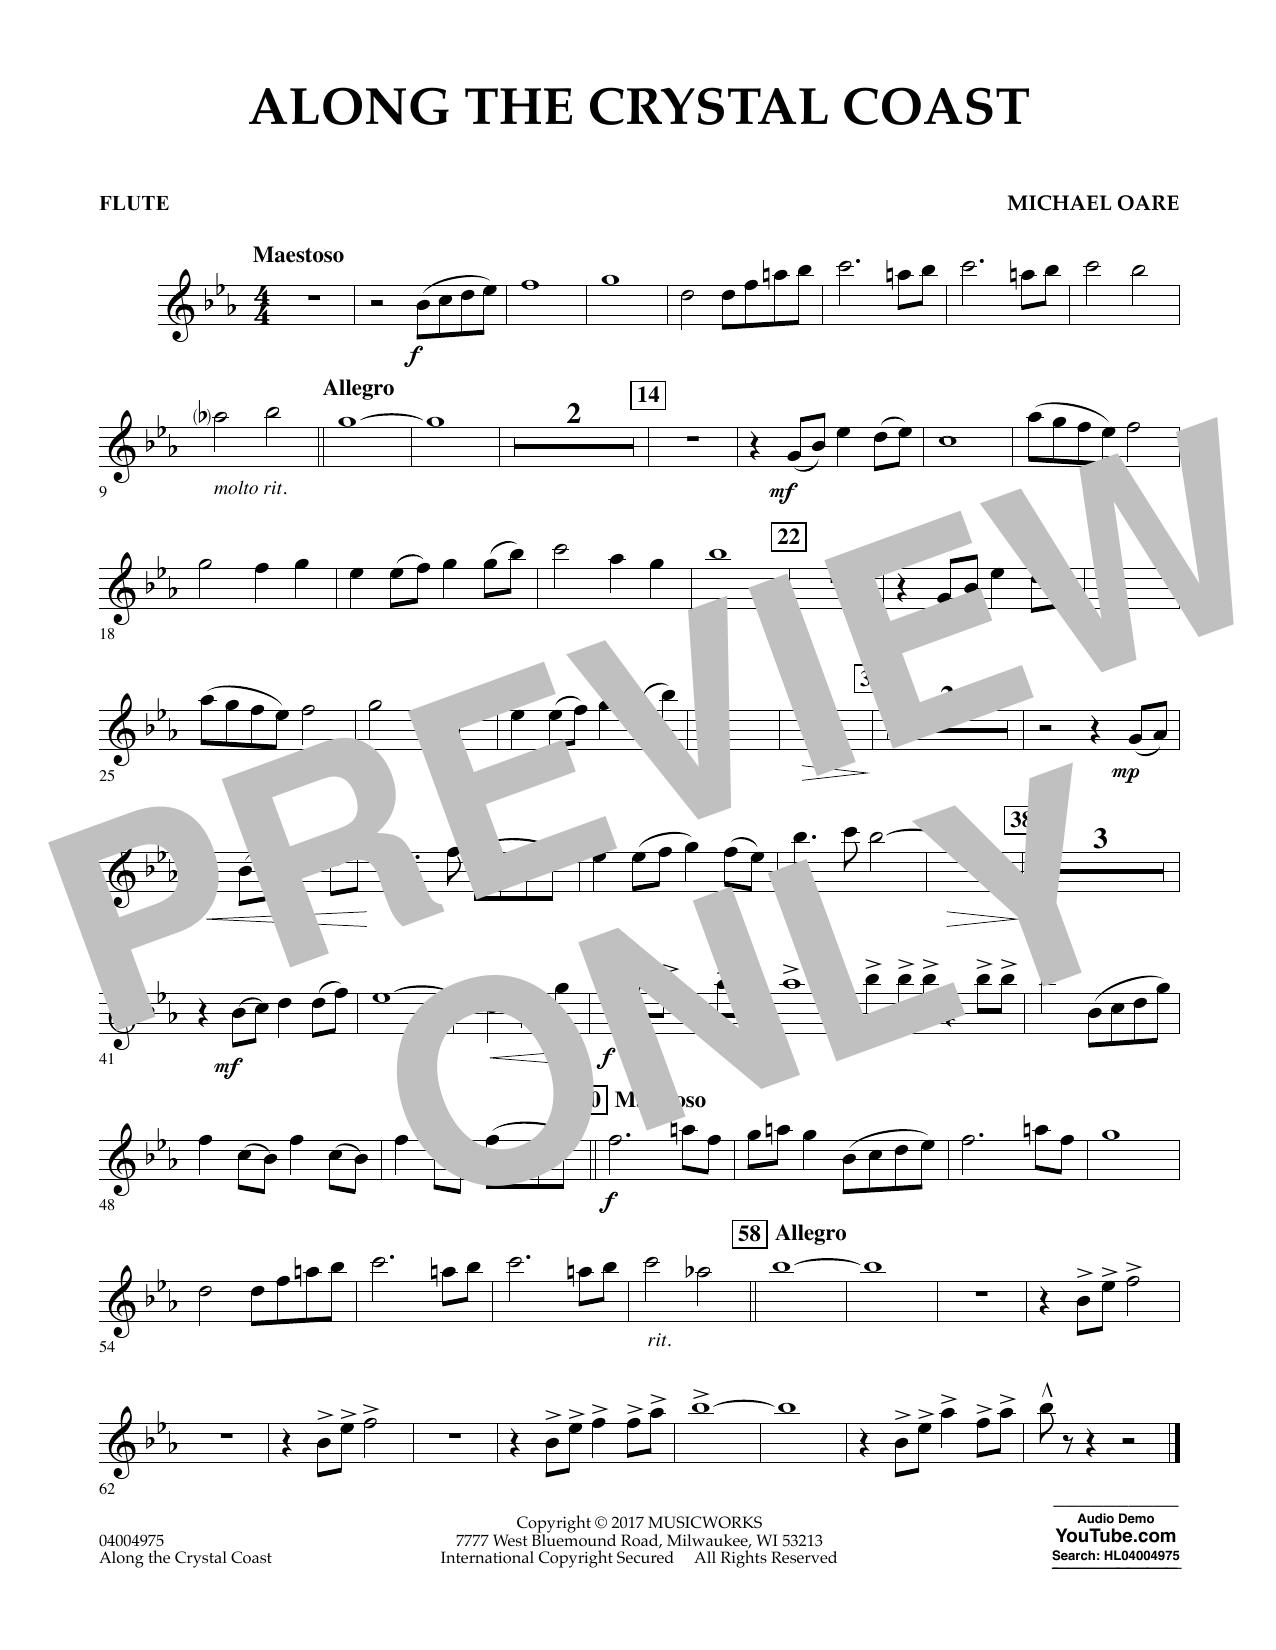 Along the Crystal Coast - Flute Sheet Music